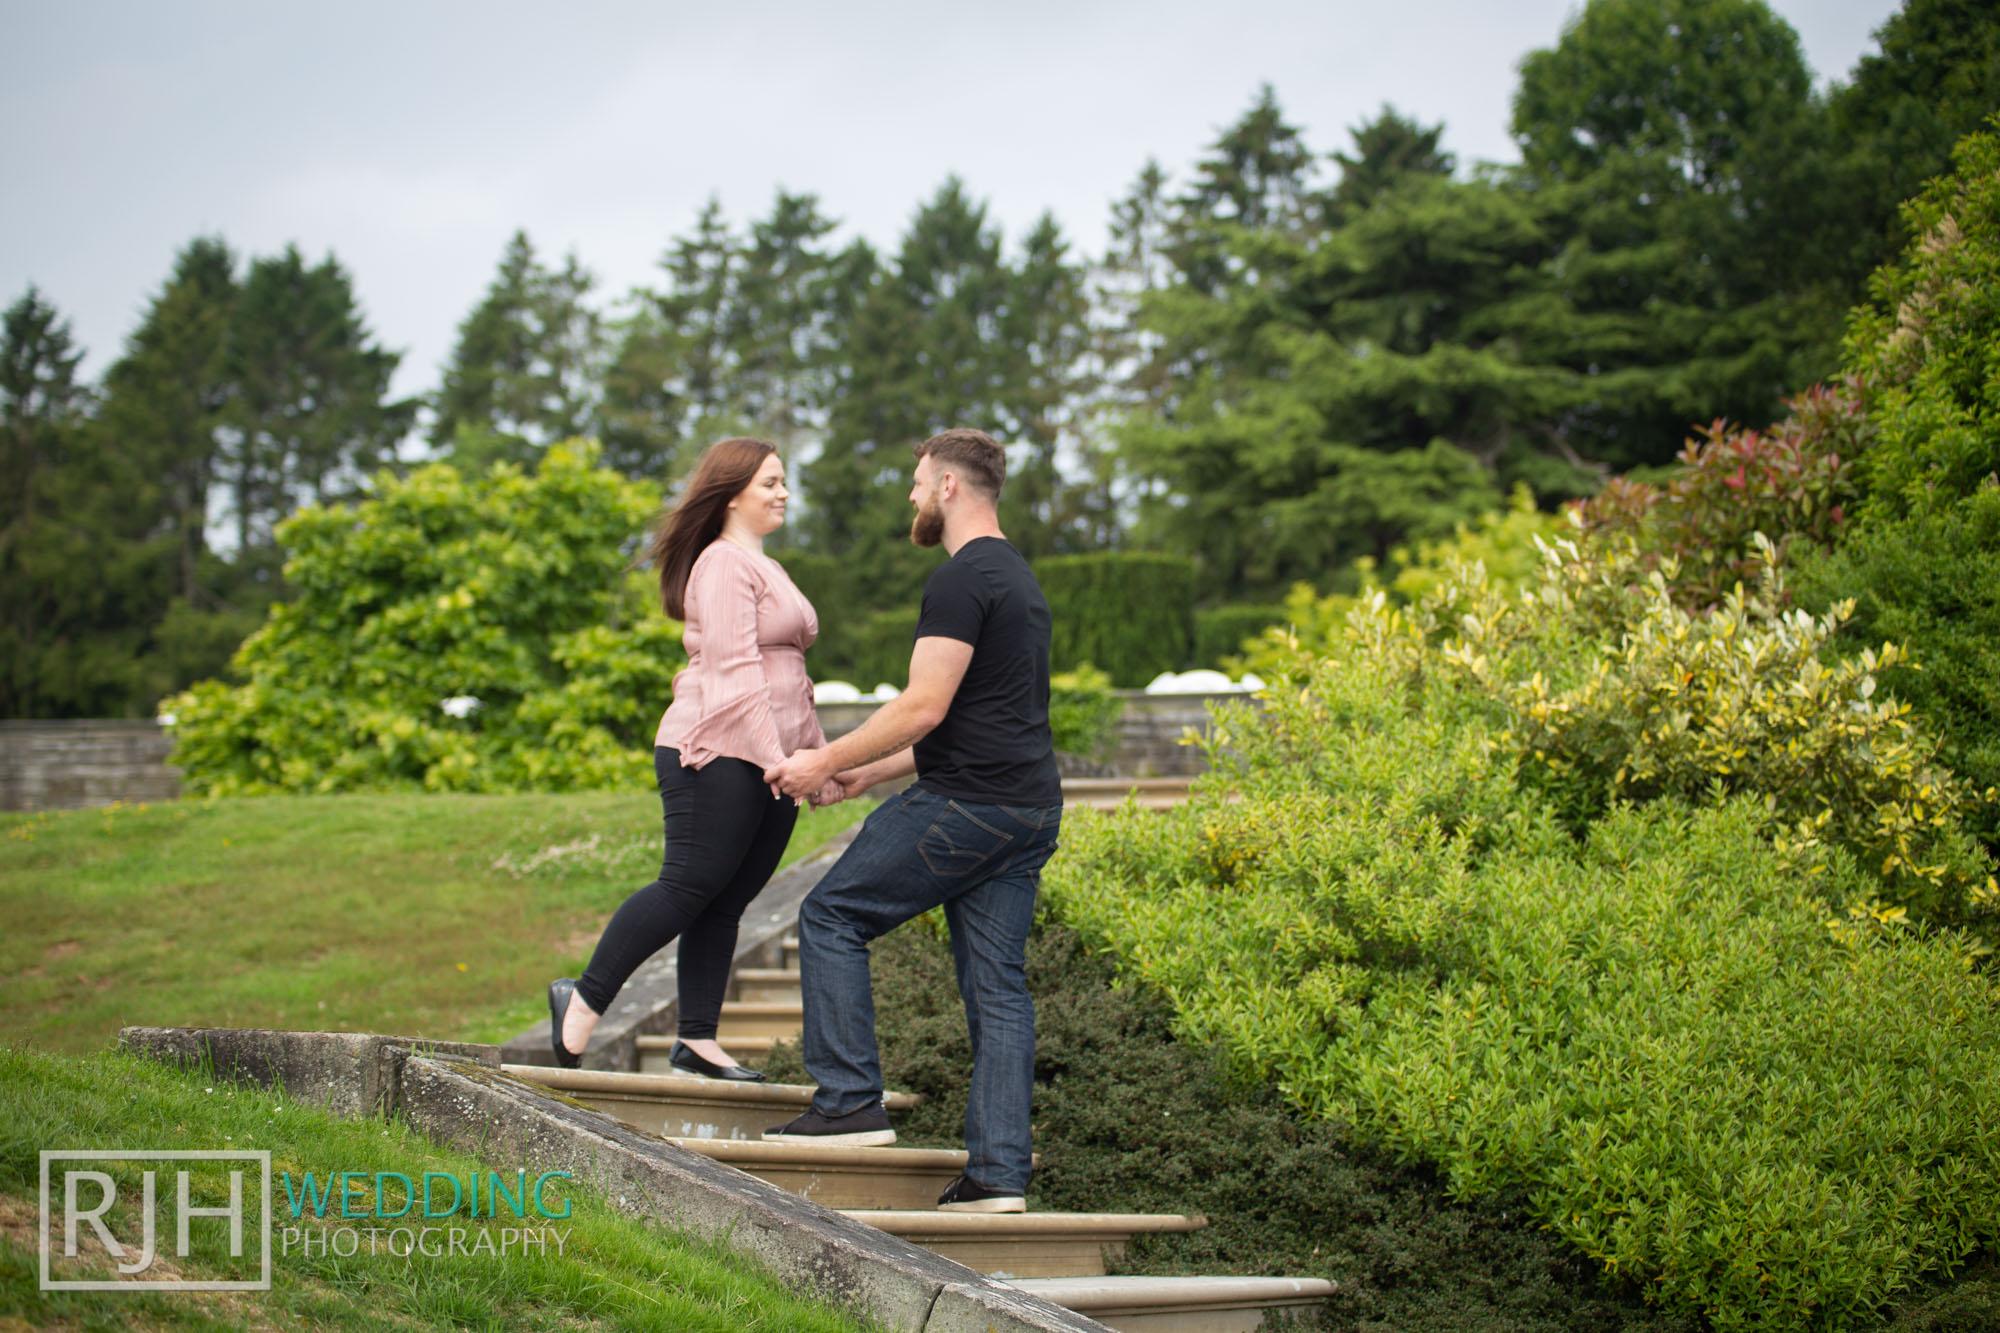 Osmaston Park Wedding Photographer - Jodie & Oli_027_IMG_7578.jpg